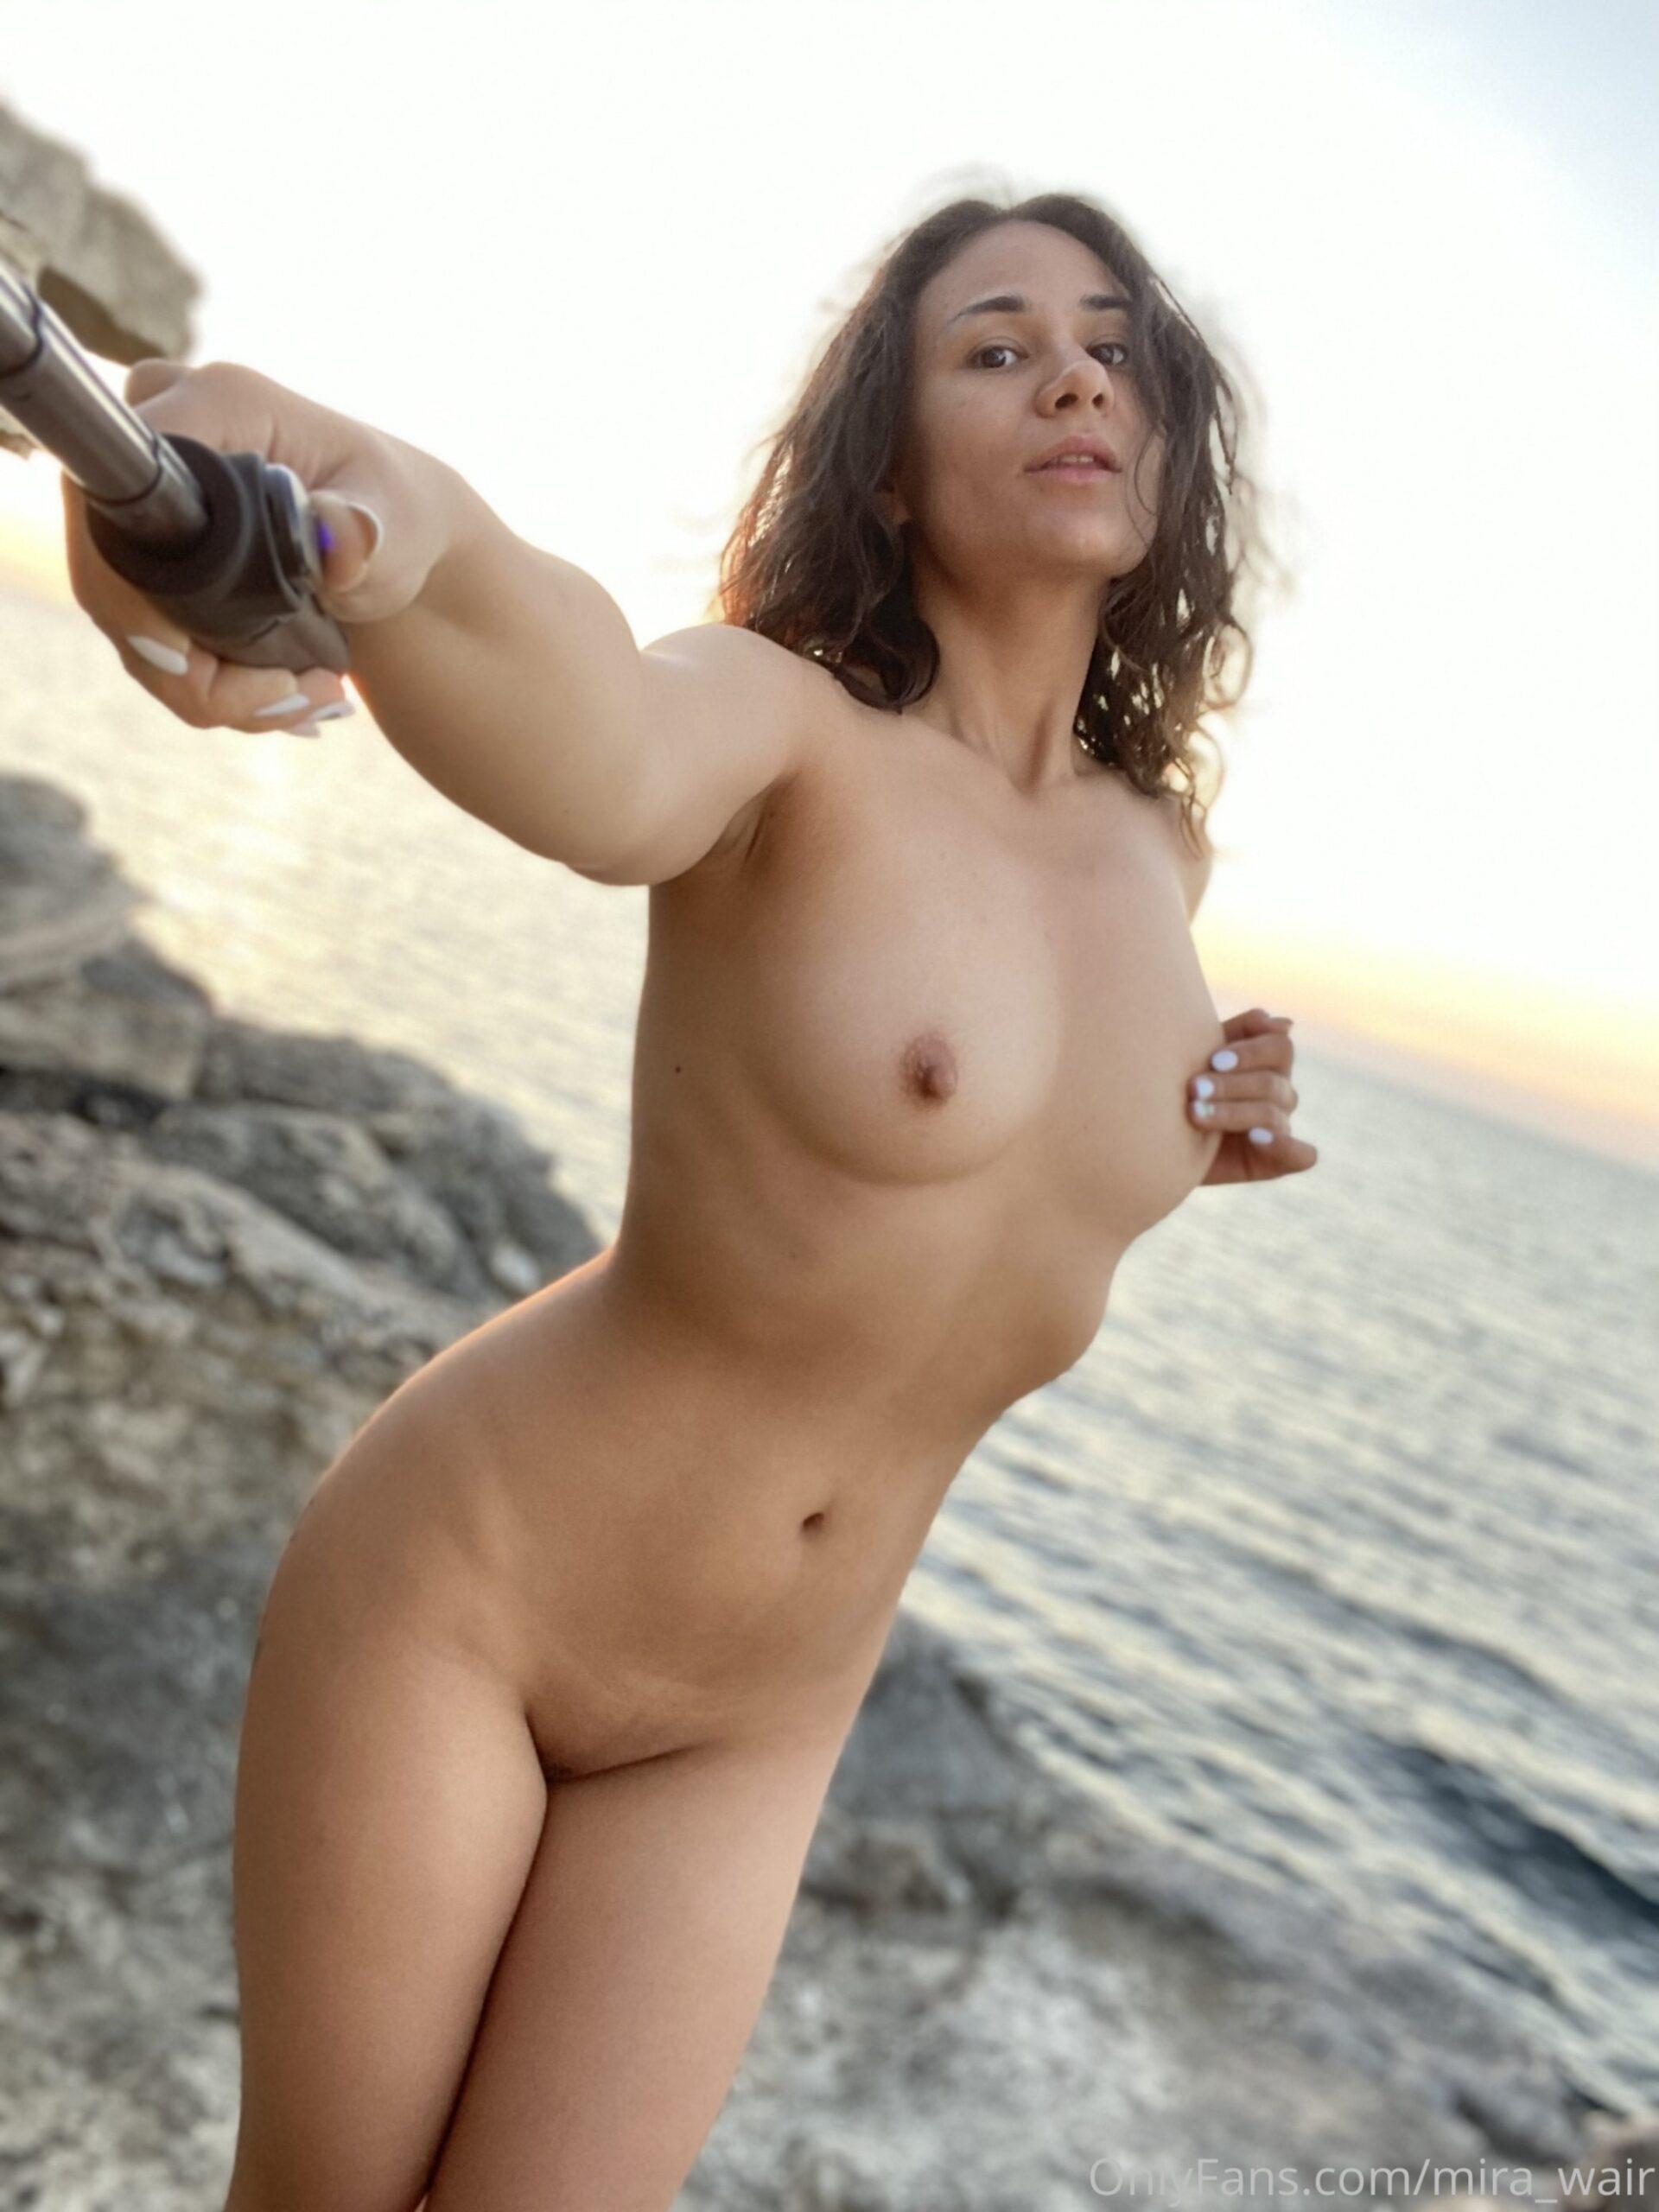 Mira Wair - Onlyfans Fotos Porno